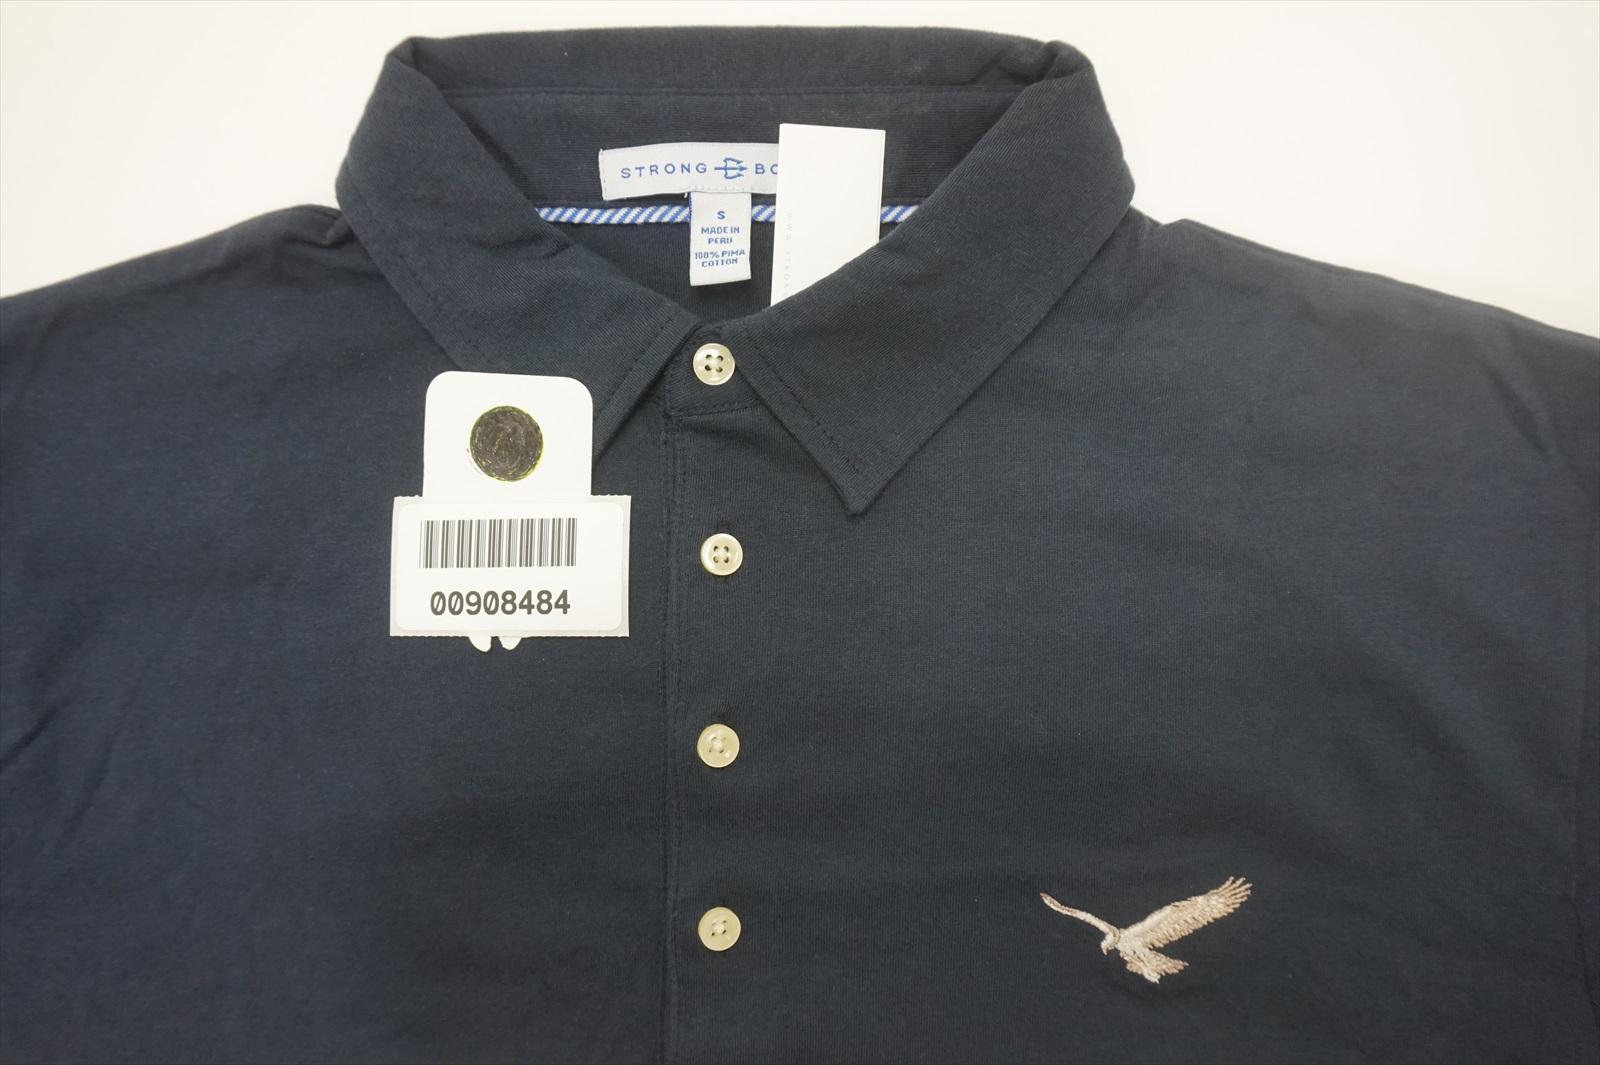 Indexbild 4 - Neu Strong Boalt Golf Long Sleeve Polo Herren Größe S Marine W / Logo 582A